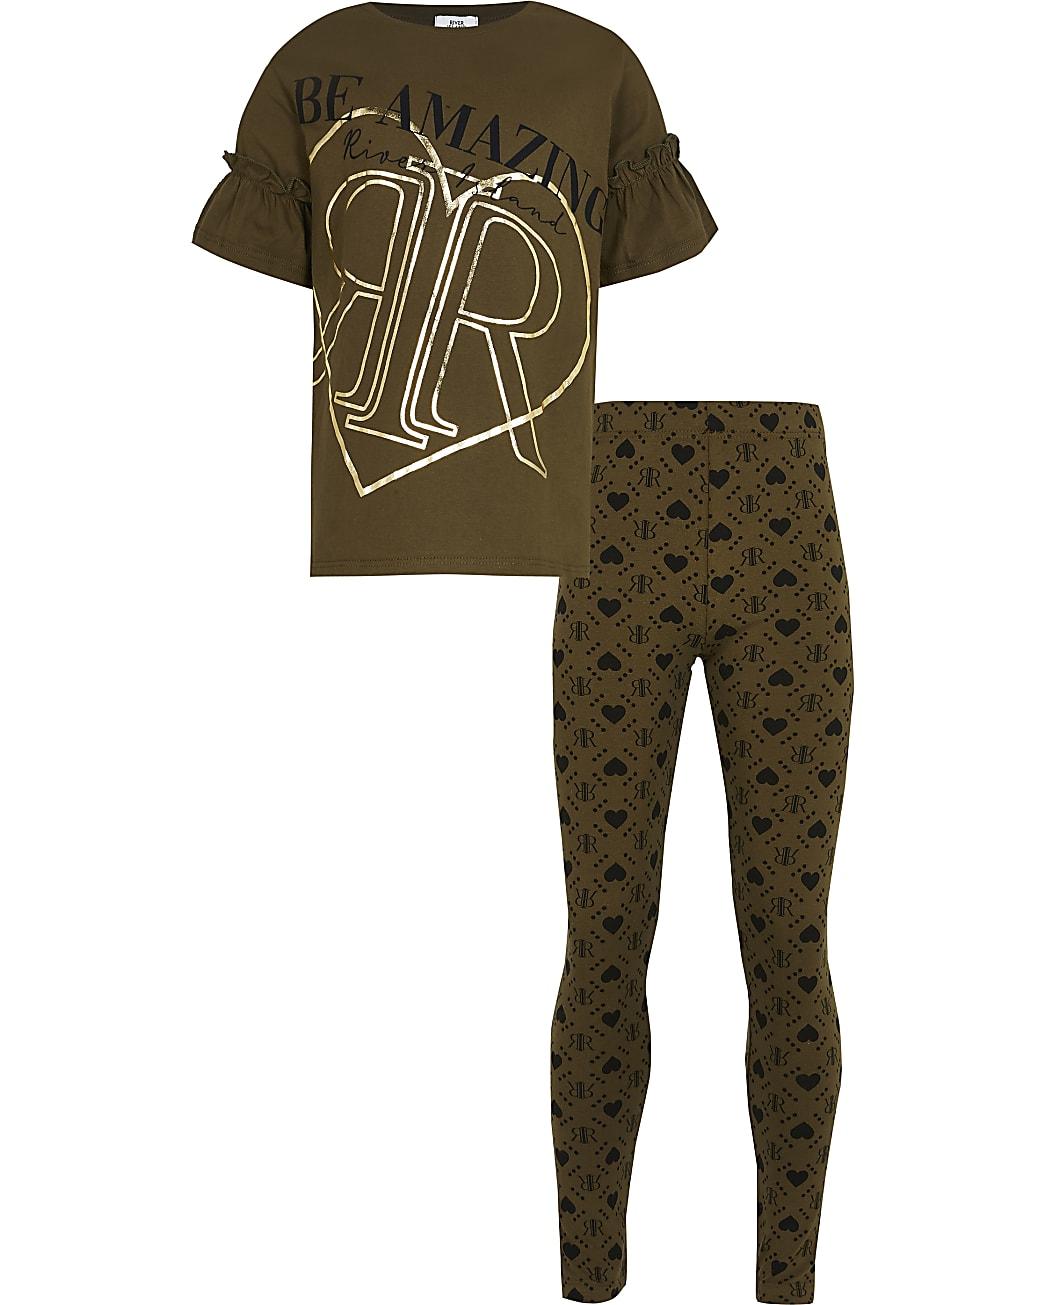 Girls Khaki 'Be Amazing' t-shirt outfit